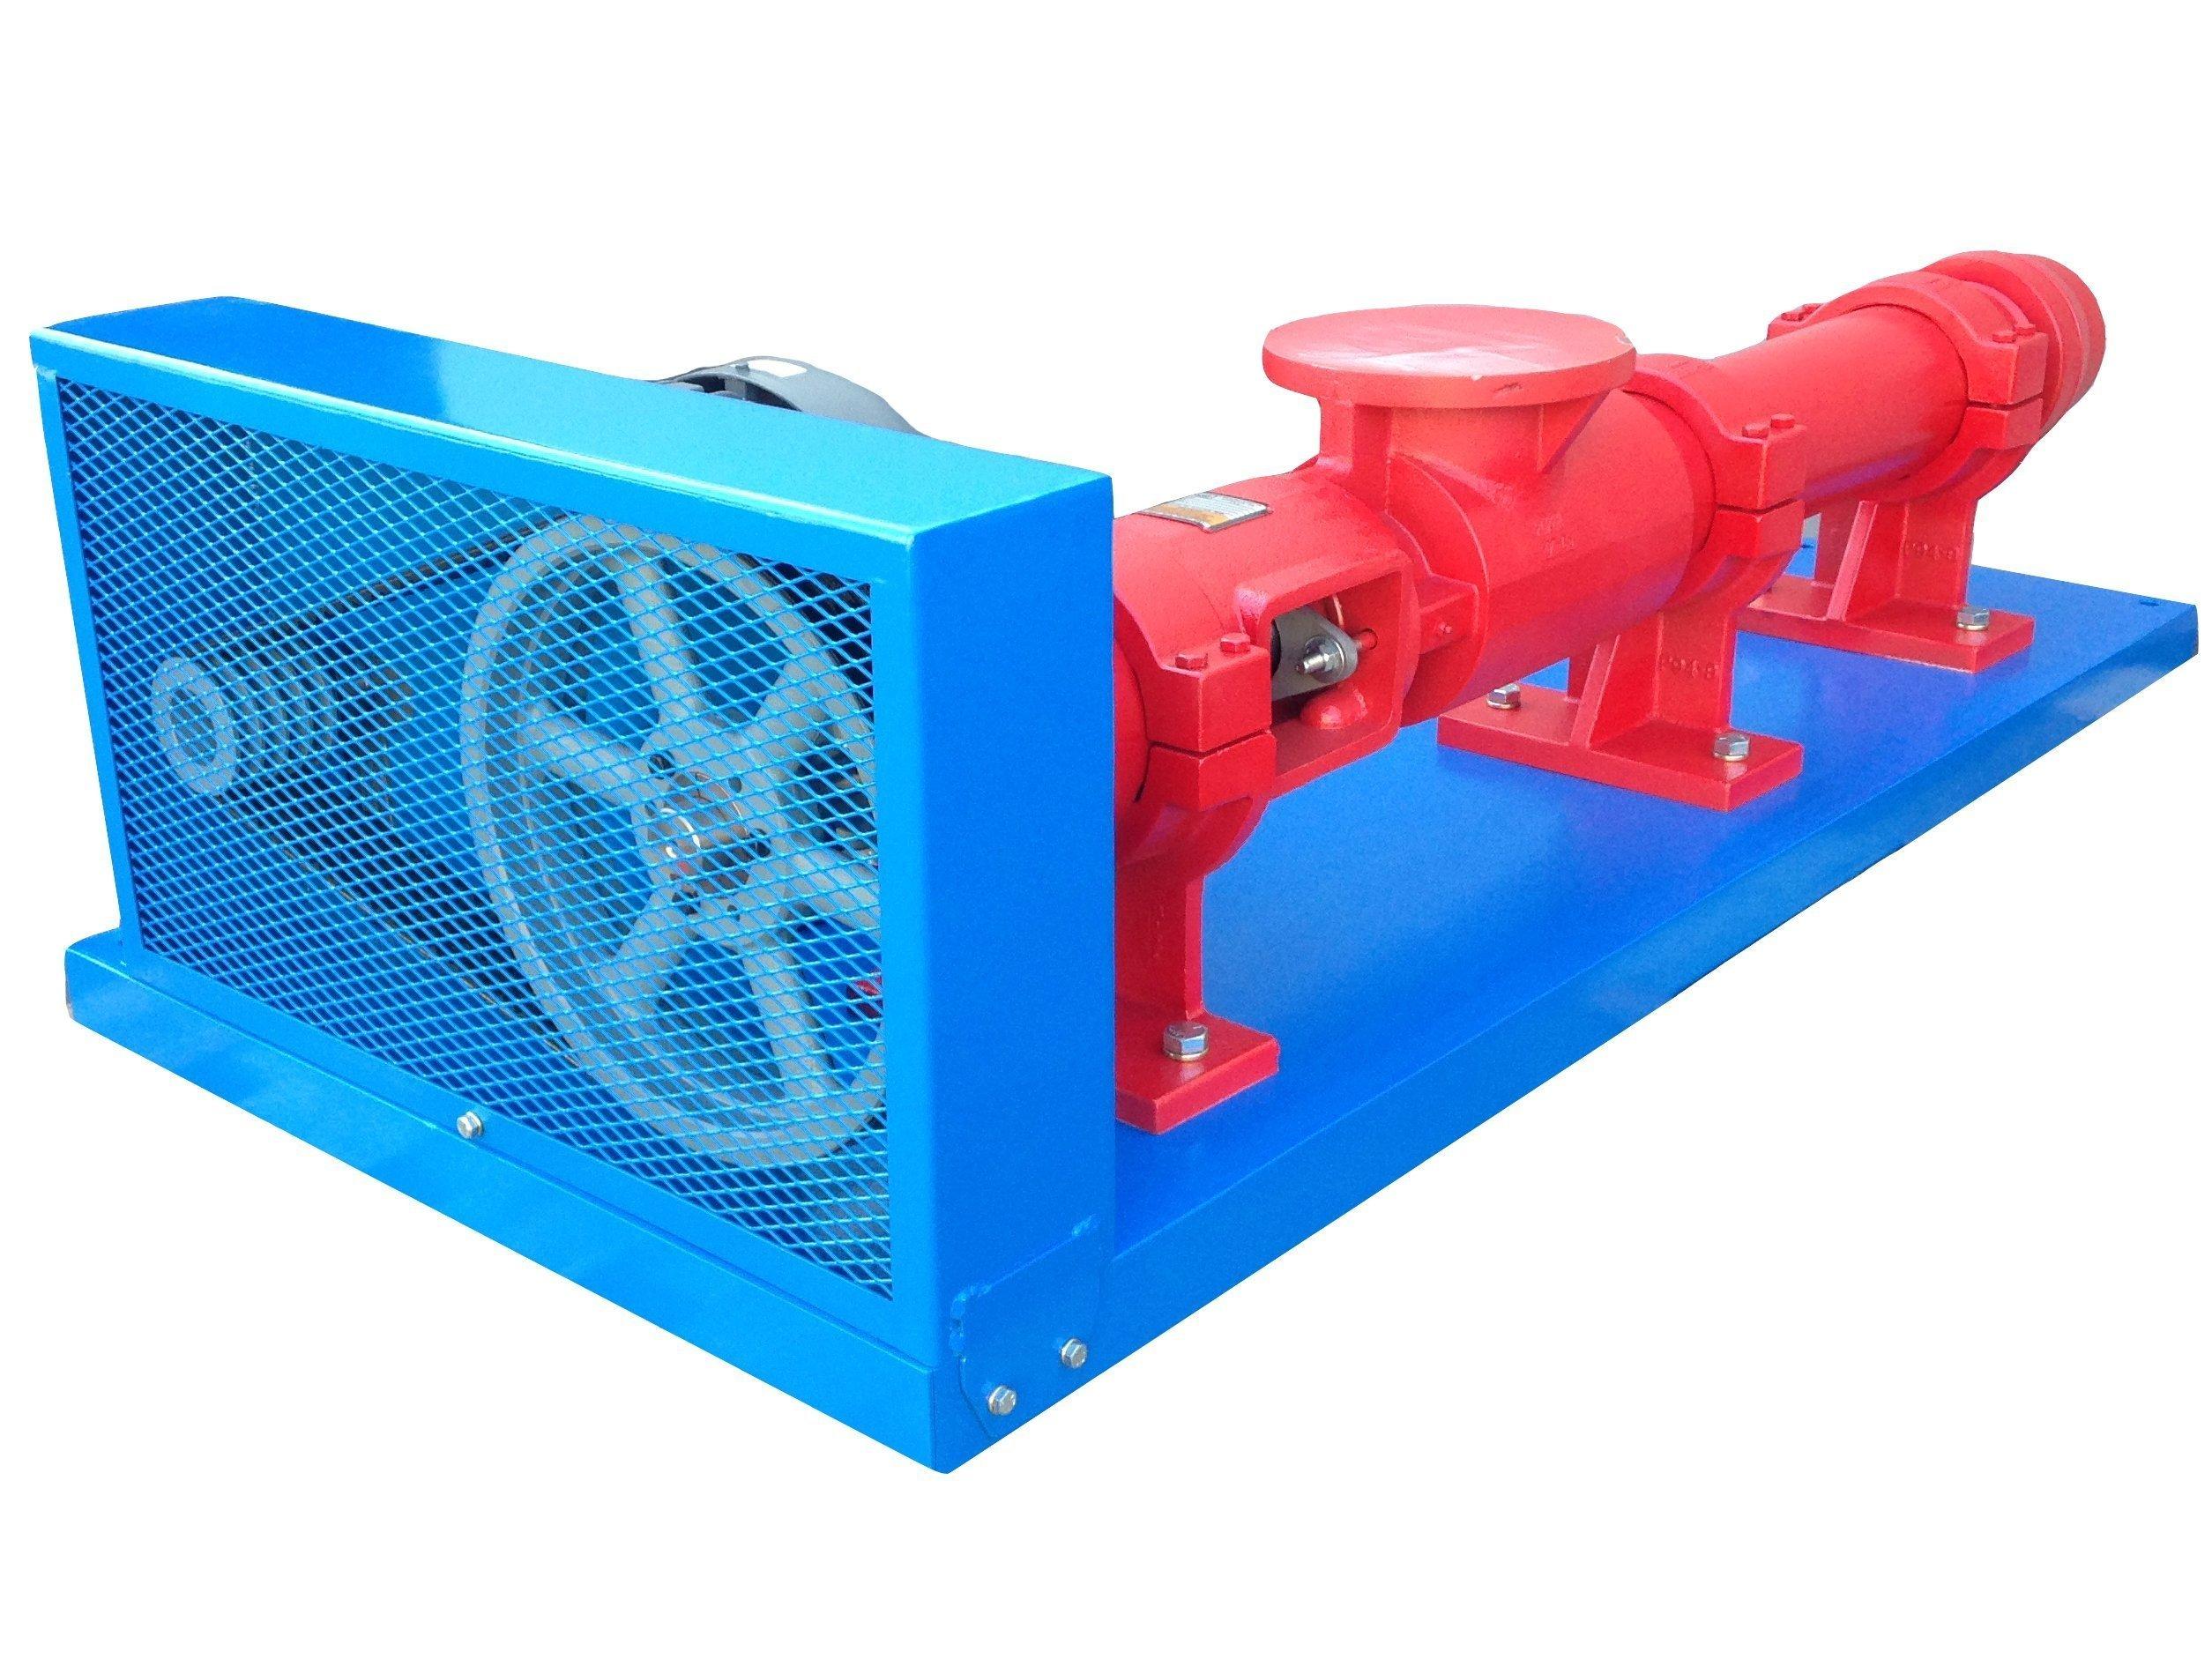 Pump and Motor Units